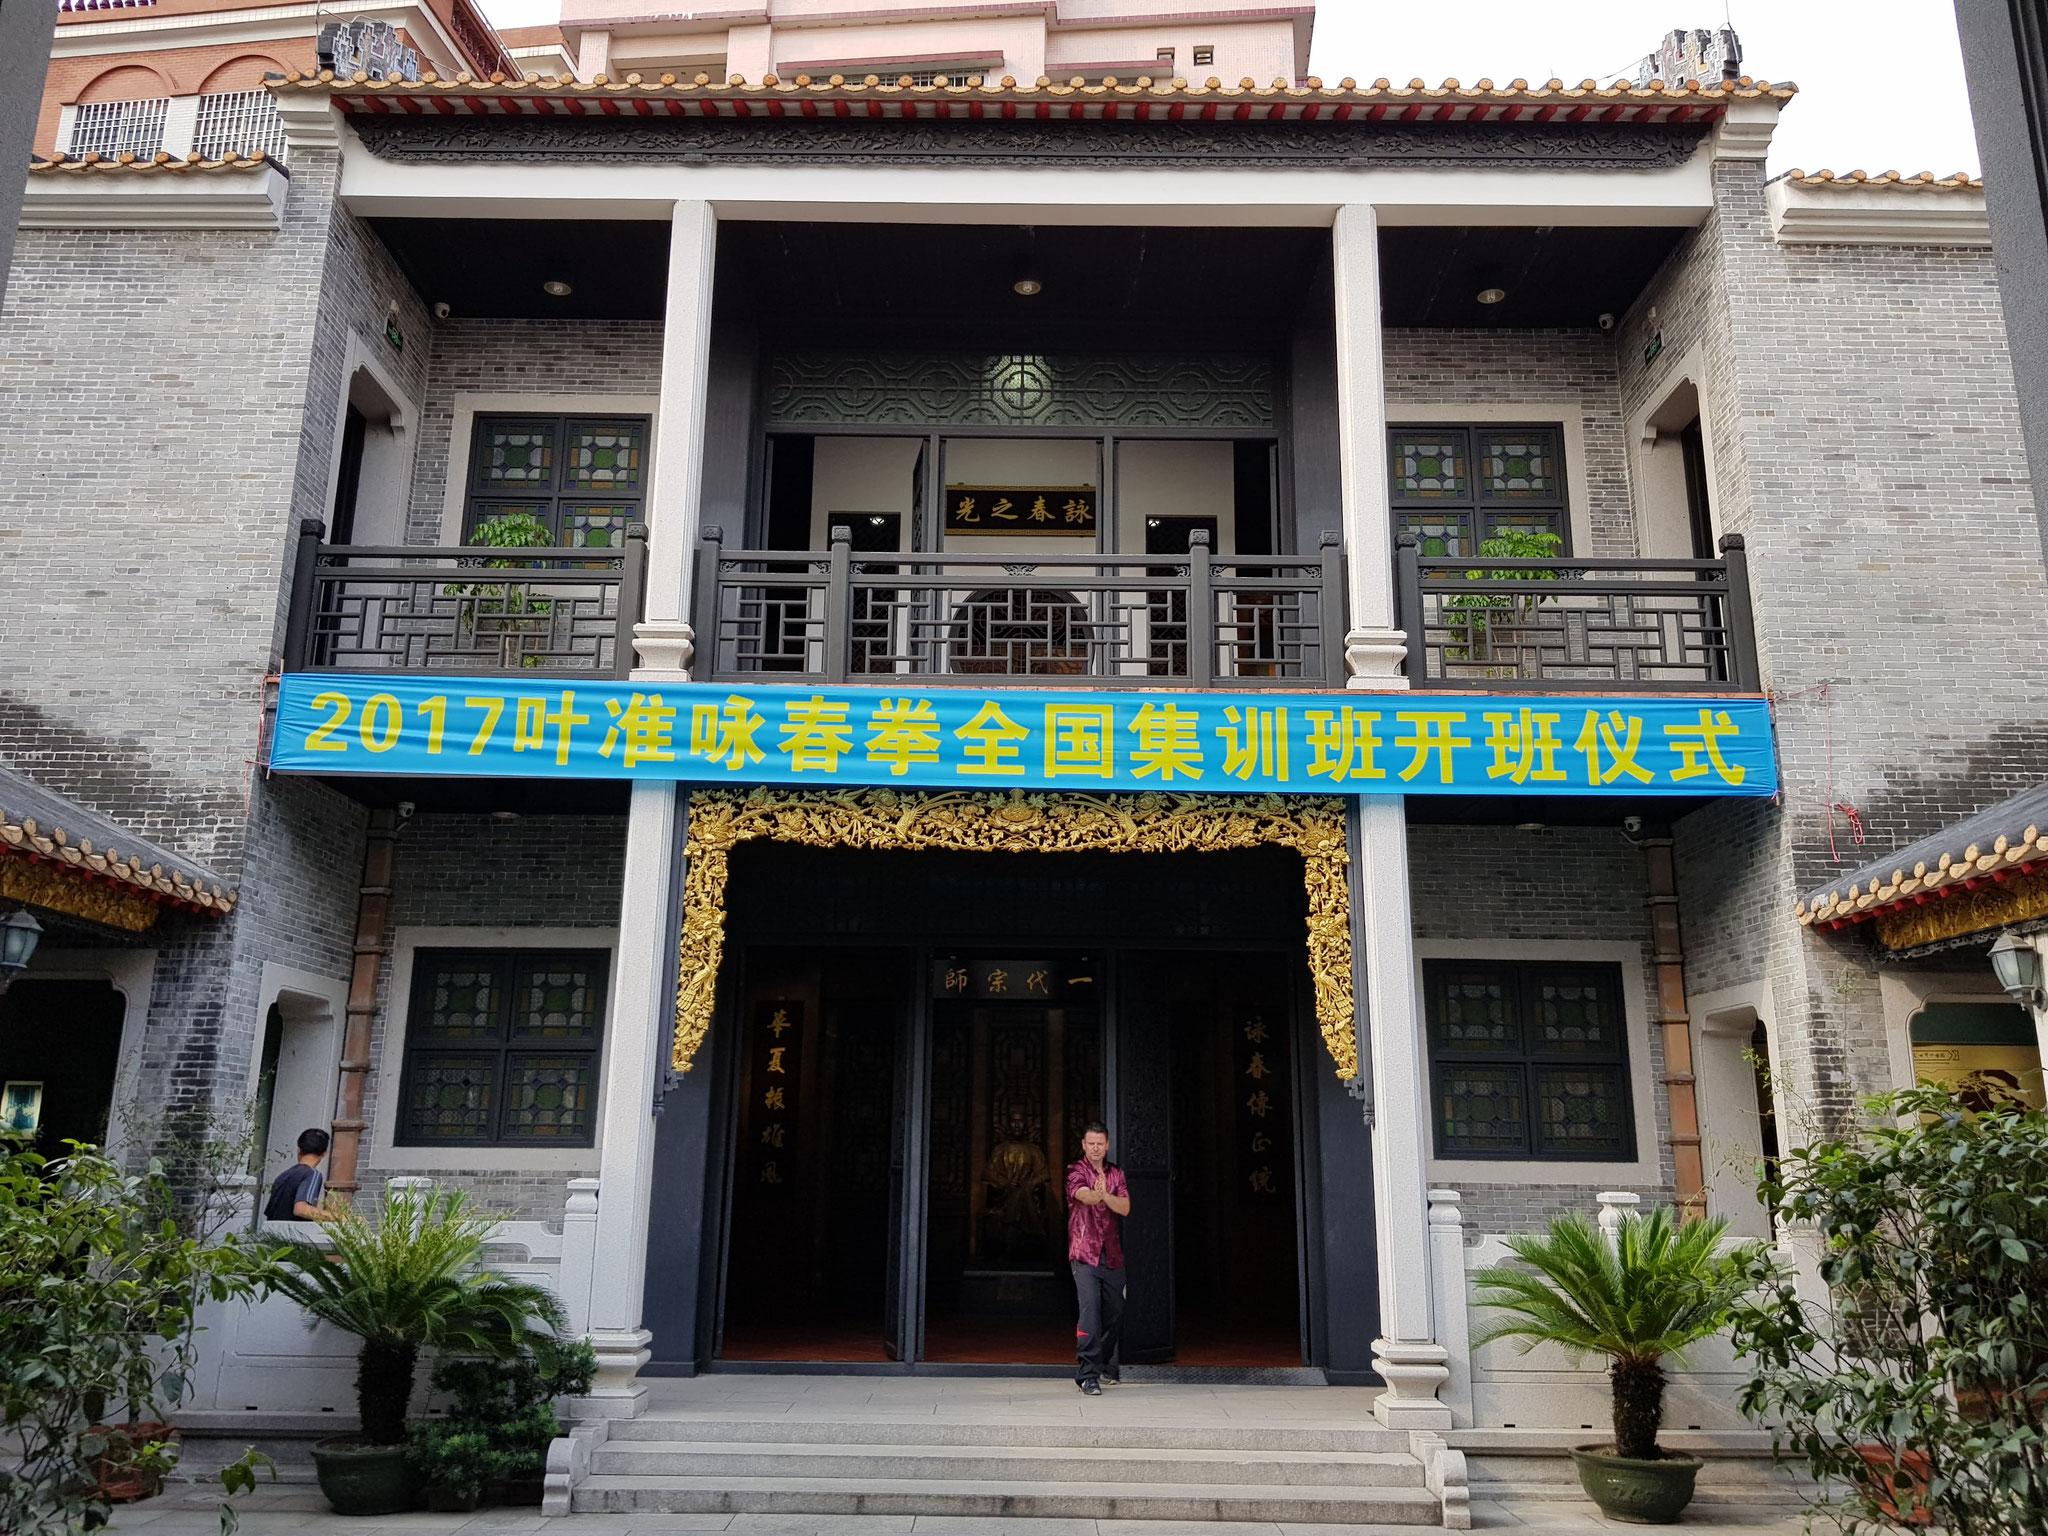 IP Man Memorial Hall China Teil 2